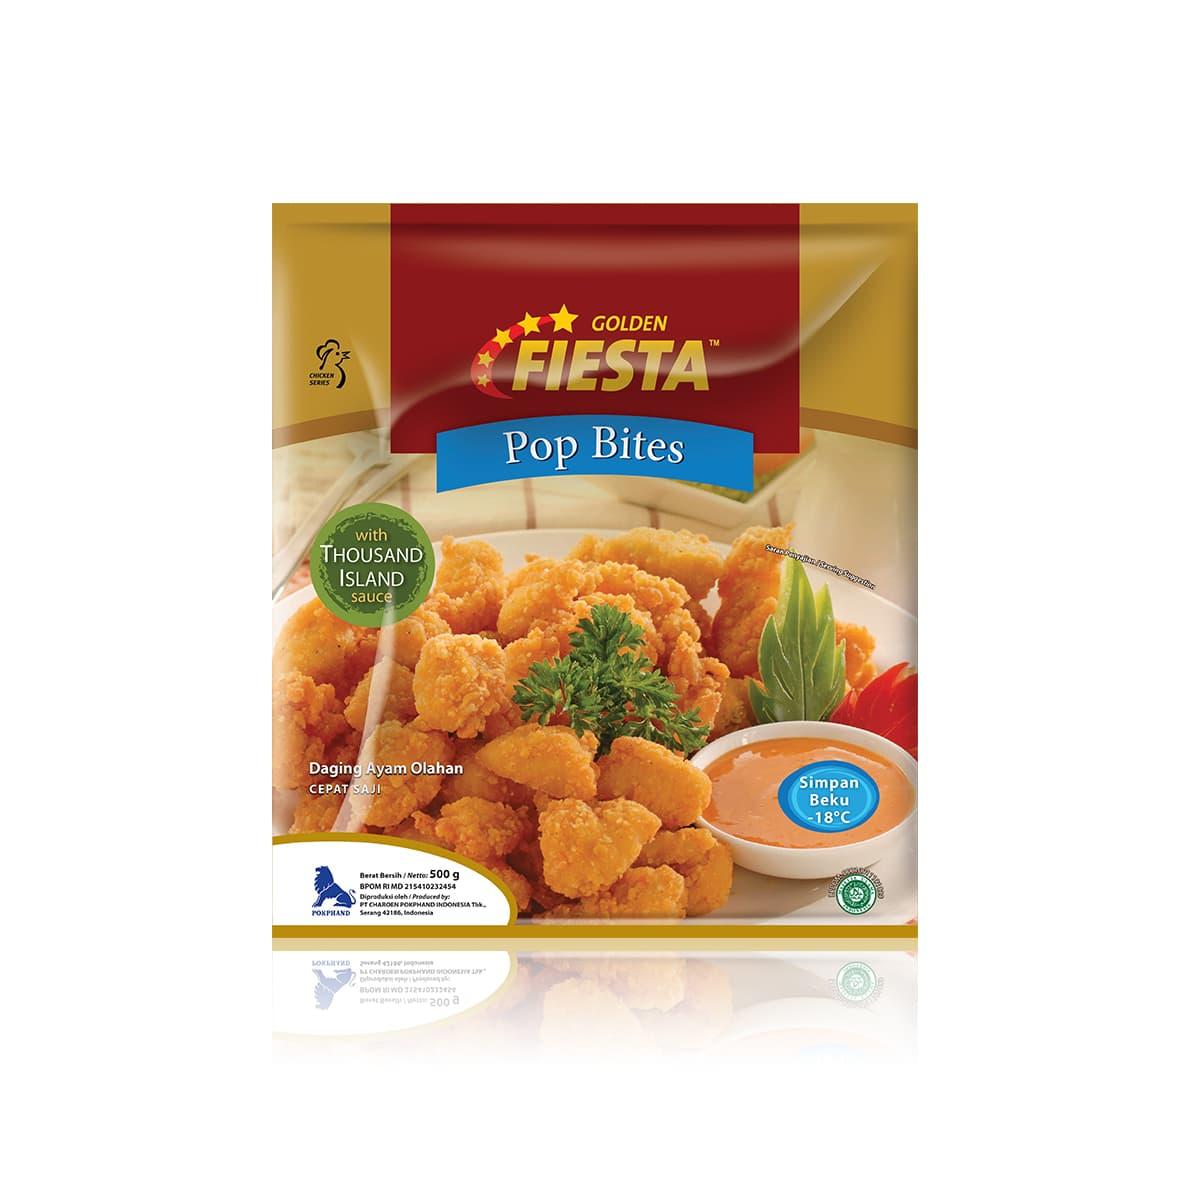 Fiesta Paket Golden Pop Bites Makanan Instant 500 G (3 Pcs) - Blanja.com